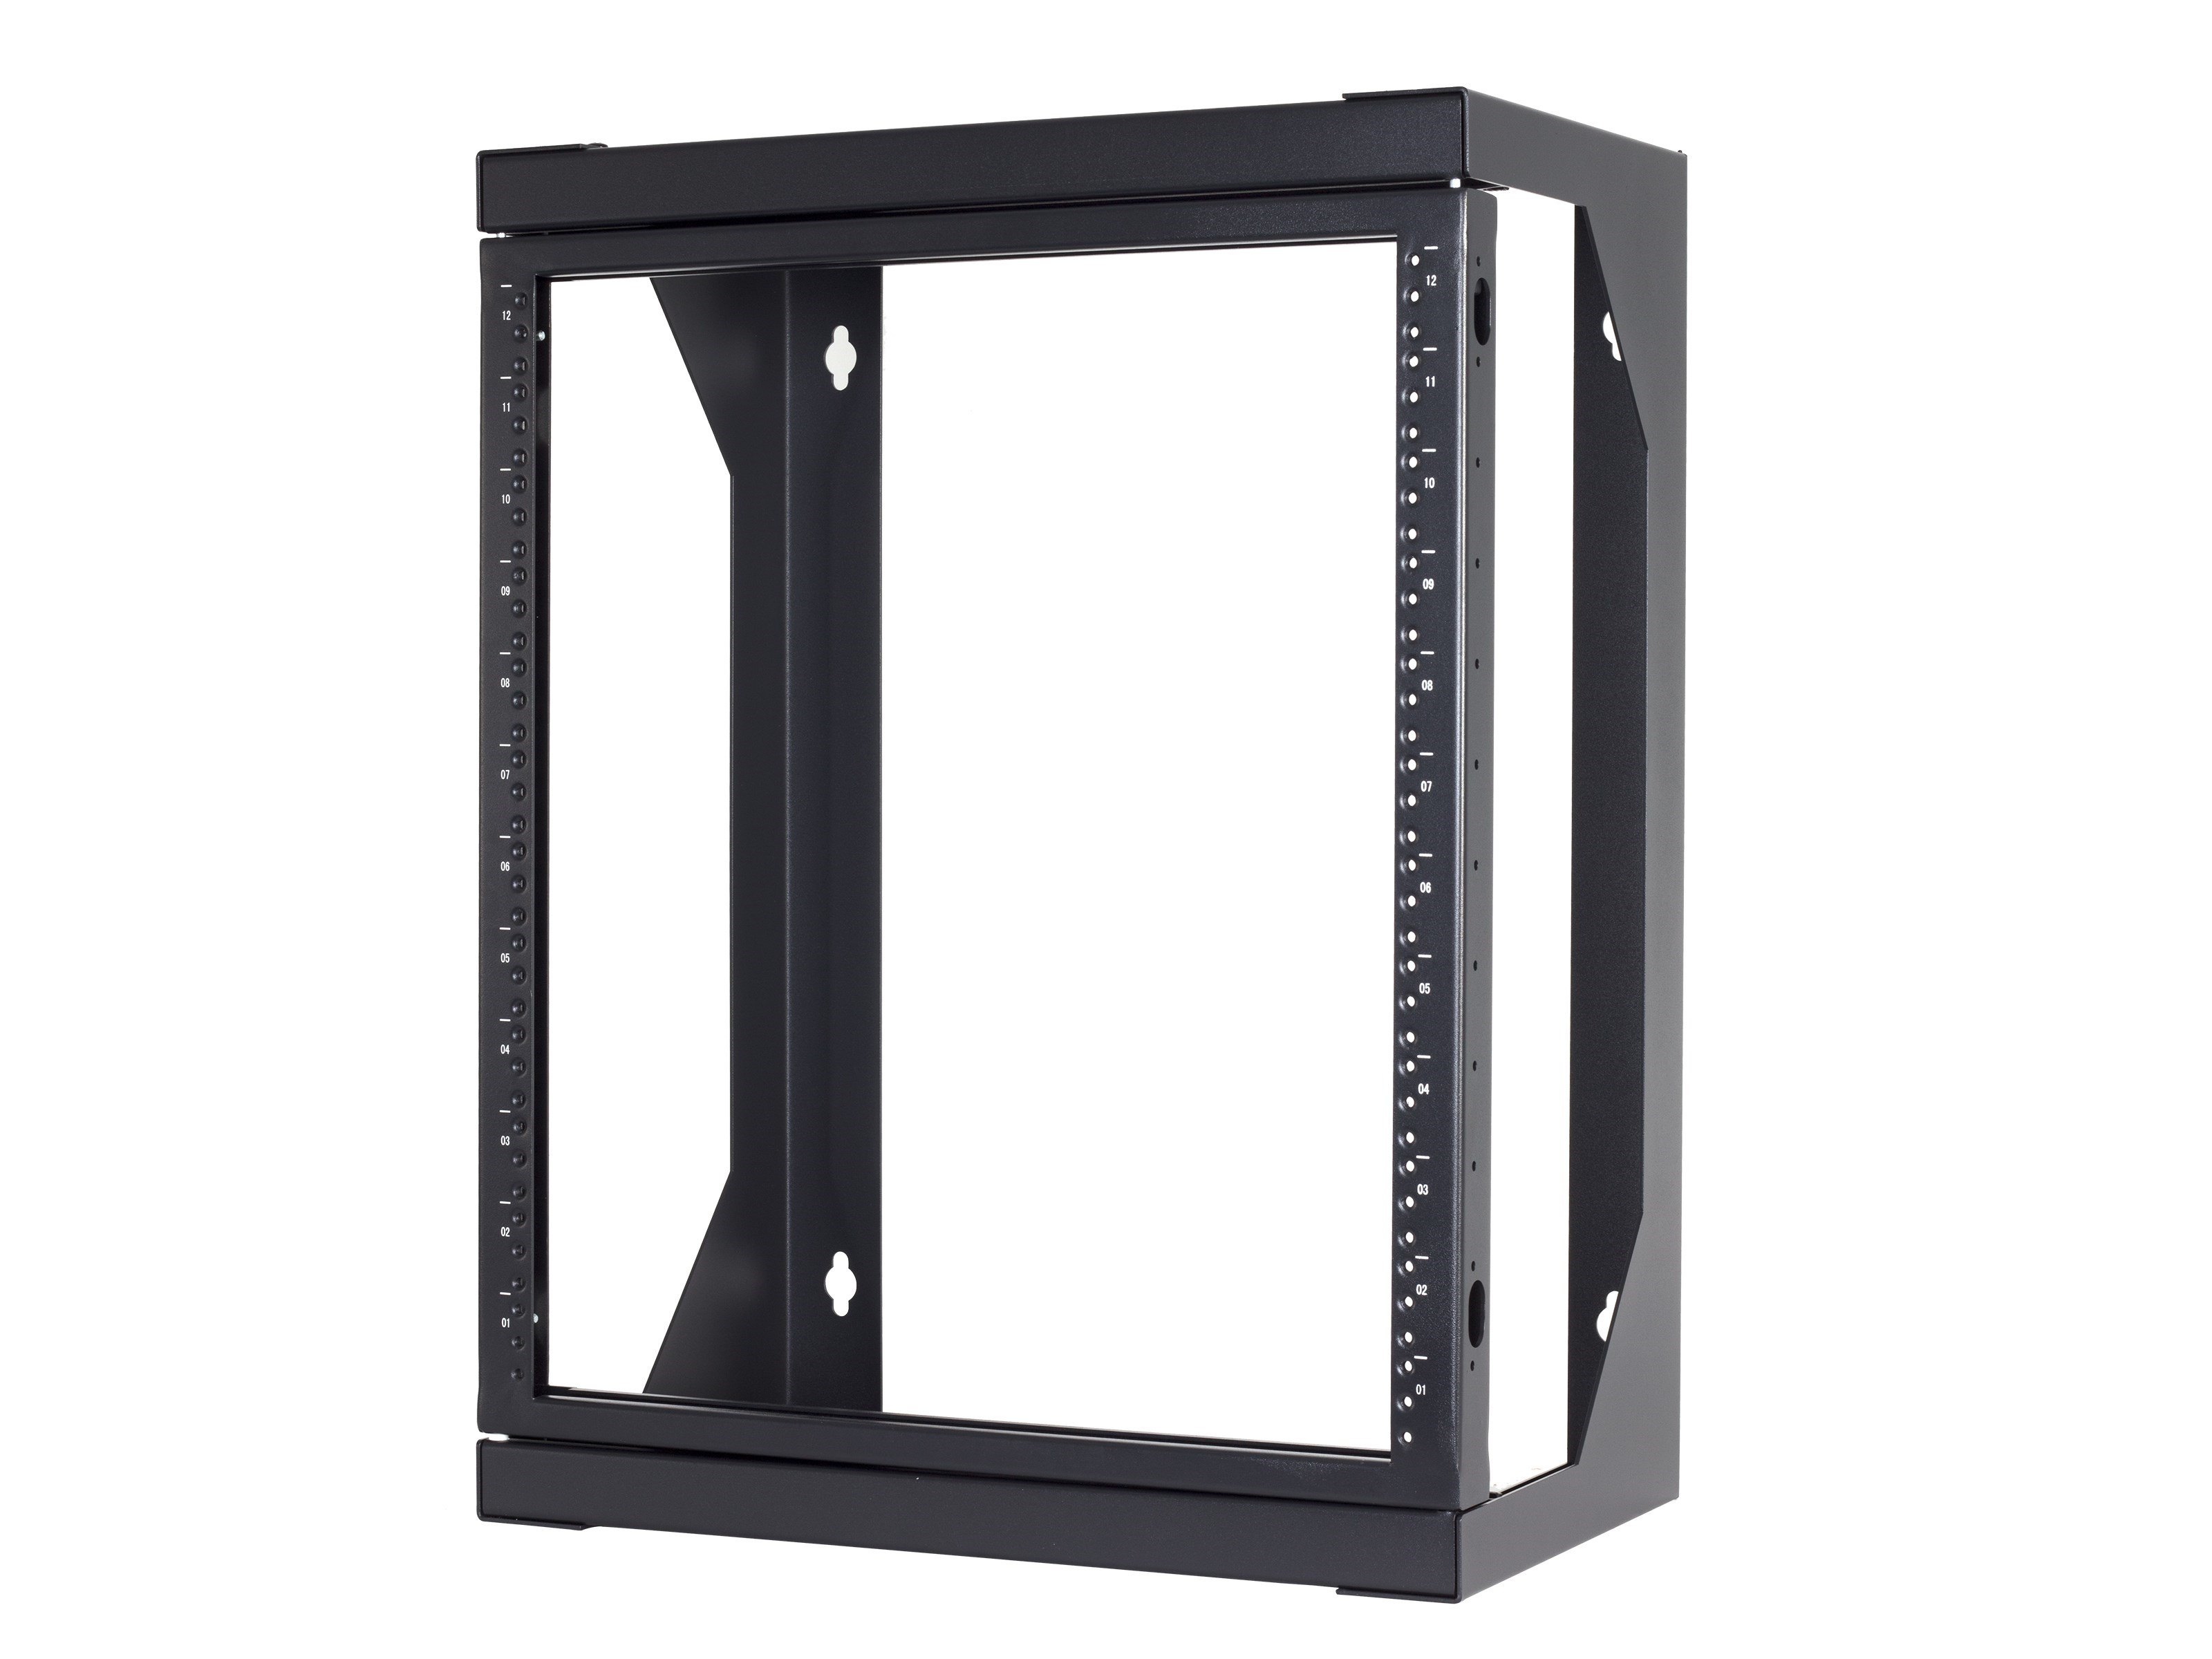 22u Open Frame Swing Out Wall Mount Rack 201 Series 16